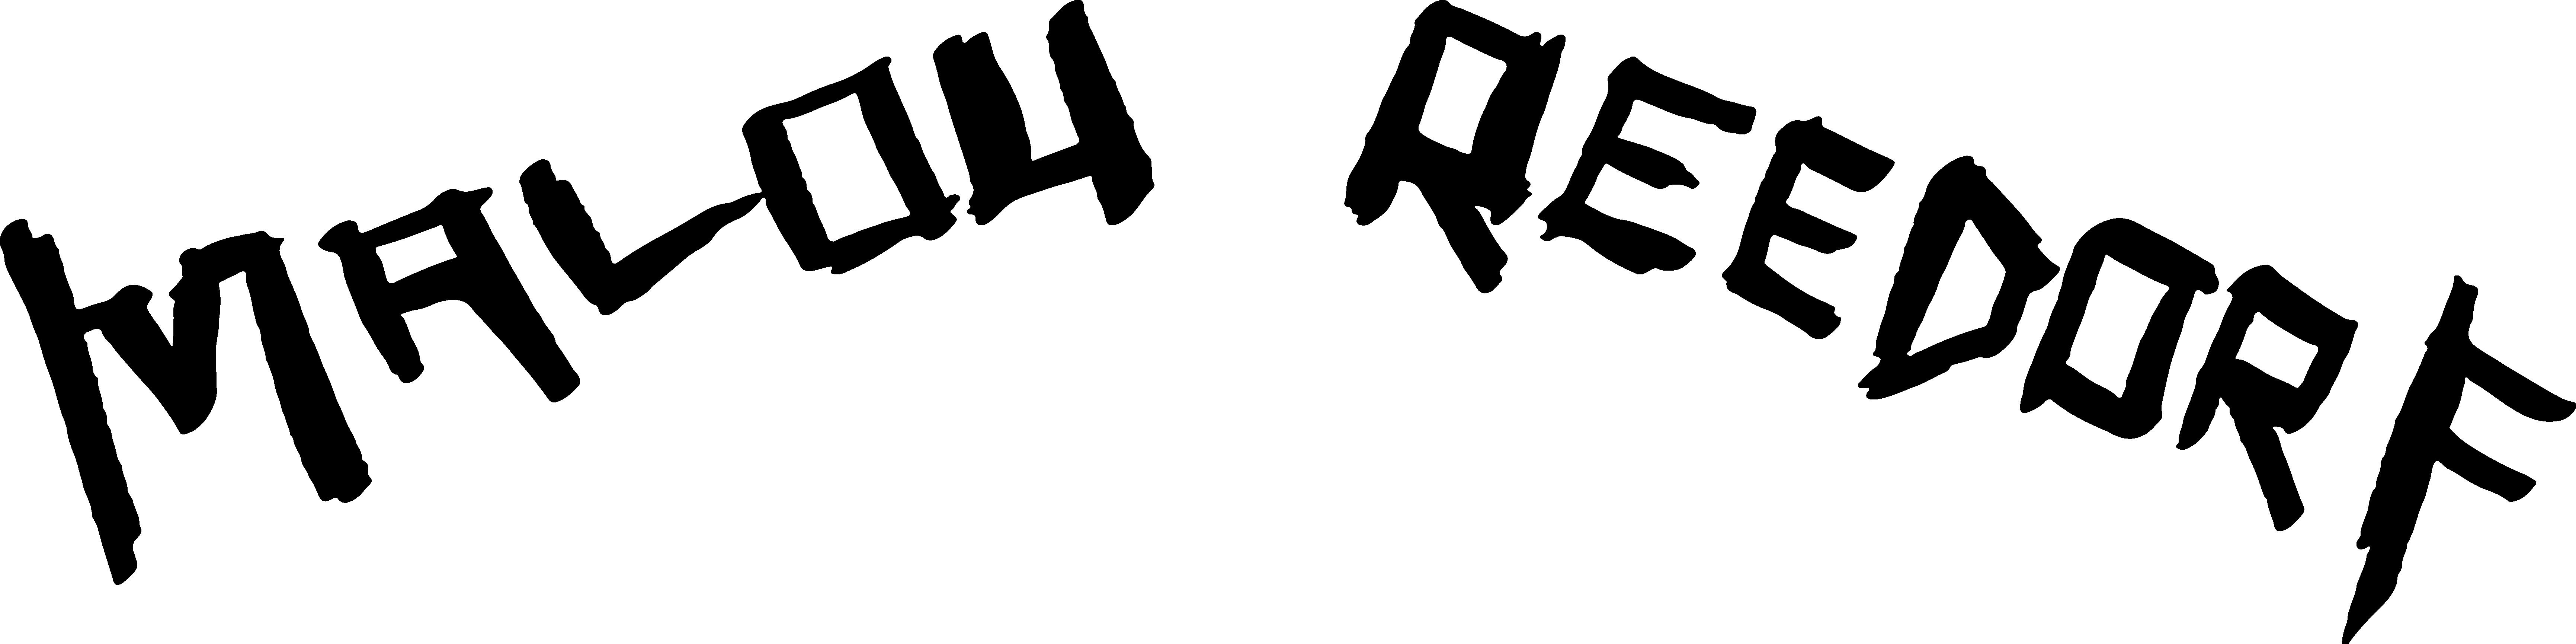 Malou Reedorf Signature